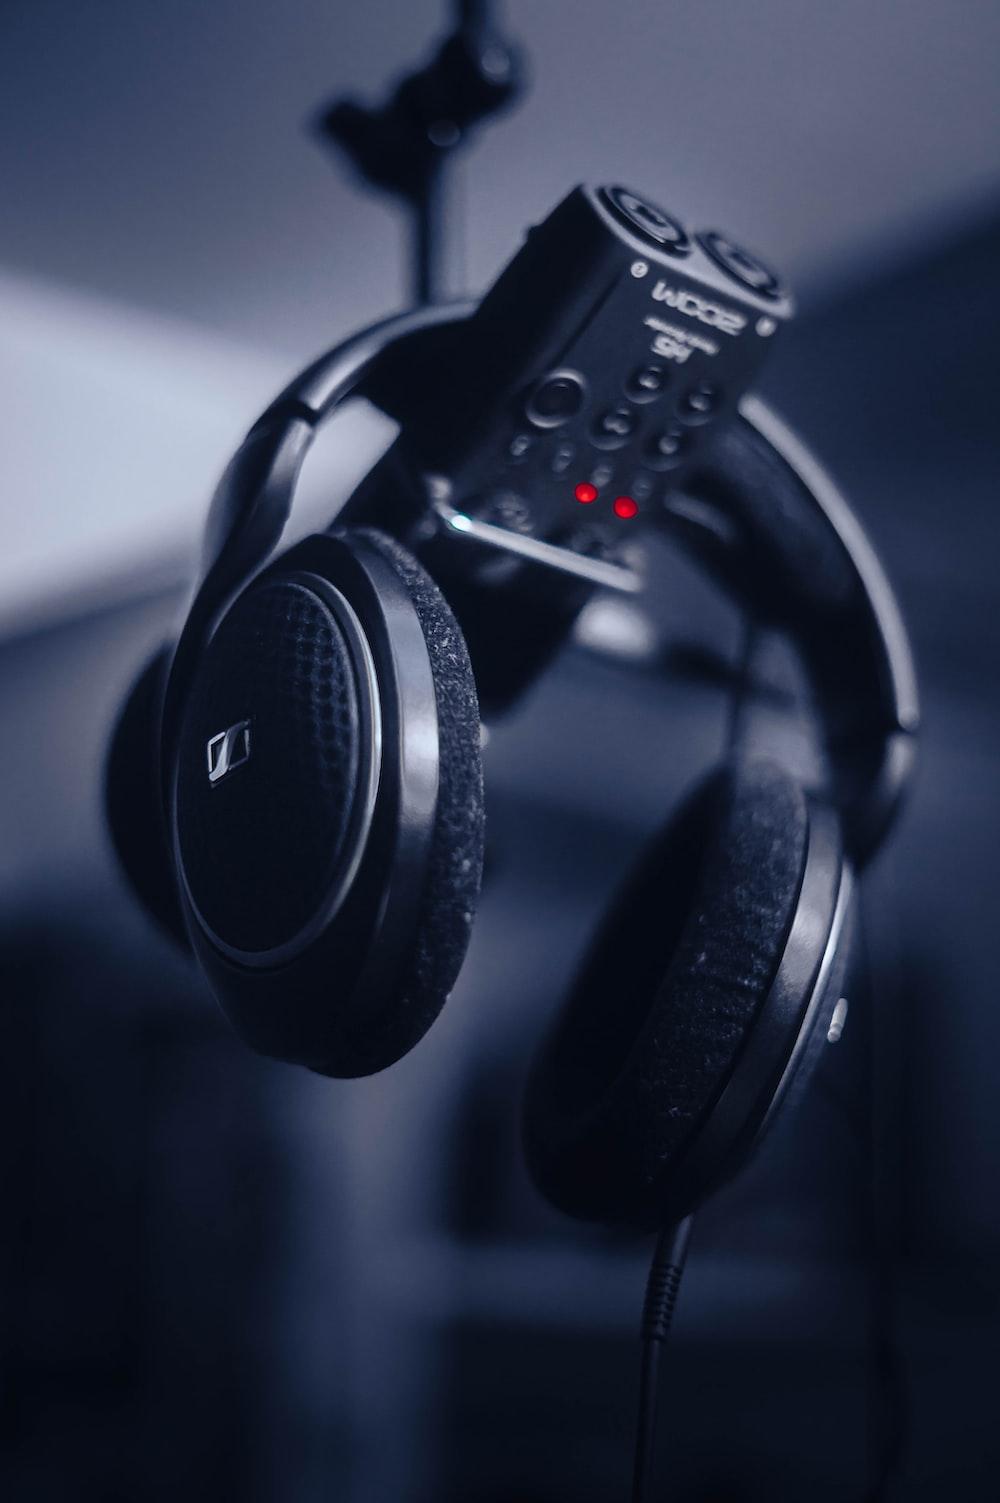 black and gray headphones on black remote control